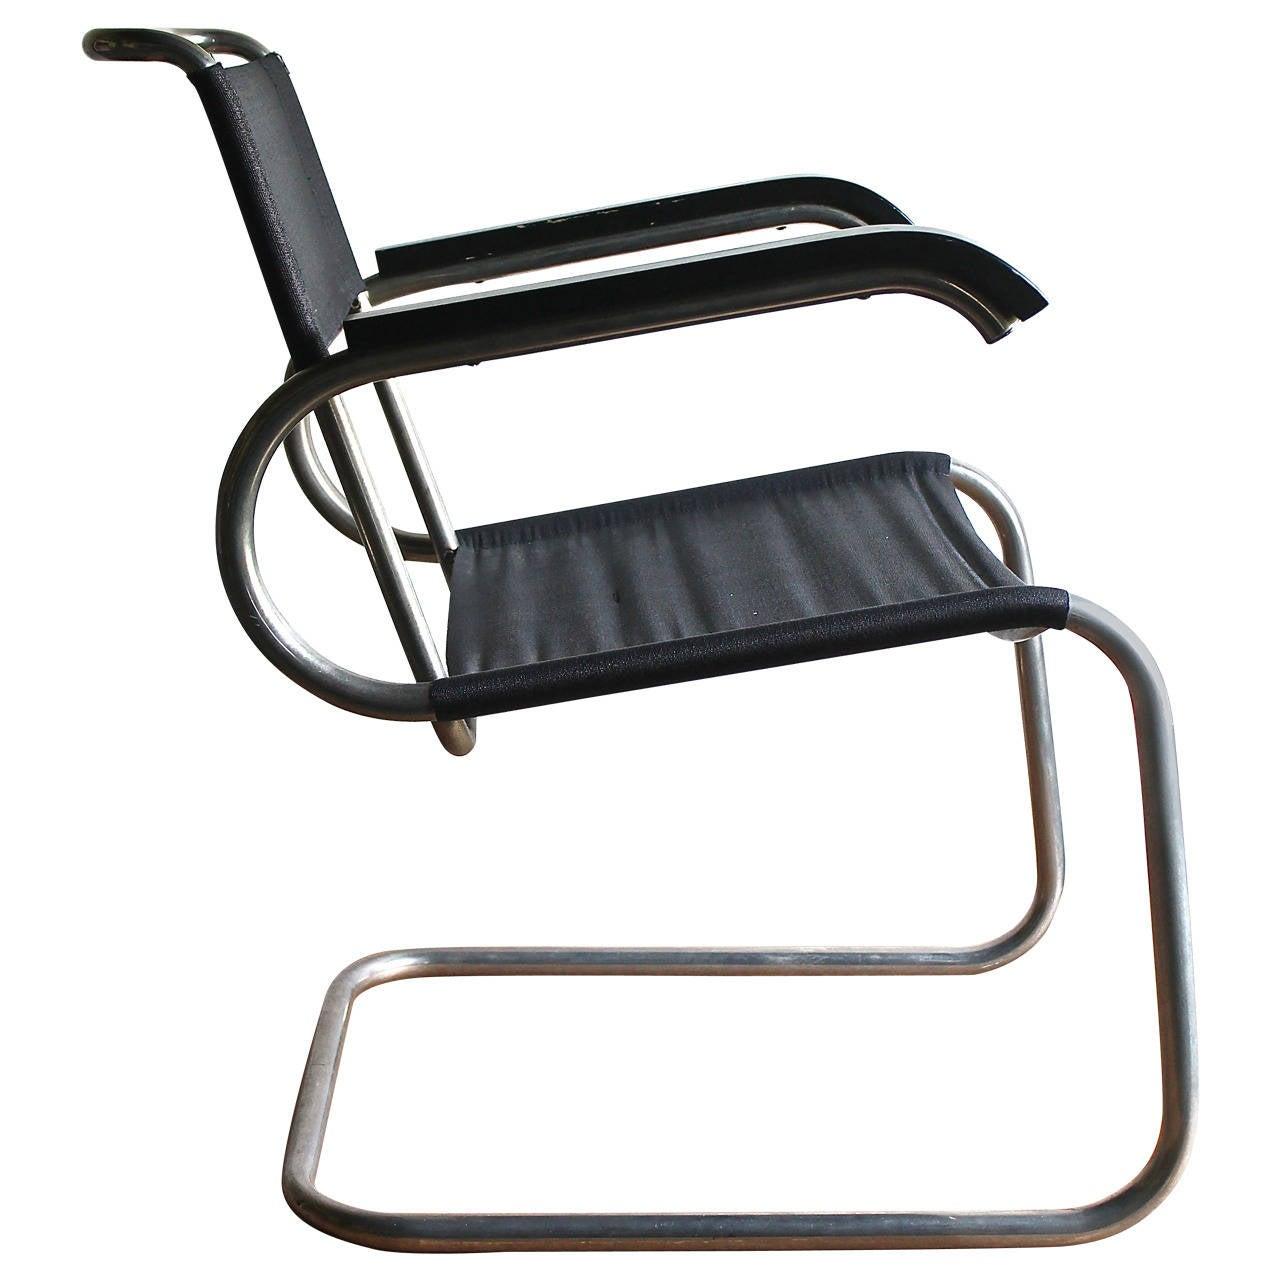 Bauhaus chair breuer - Marcel Breuer B55 Bauhaus Tubular Armchair For Tecta 1